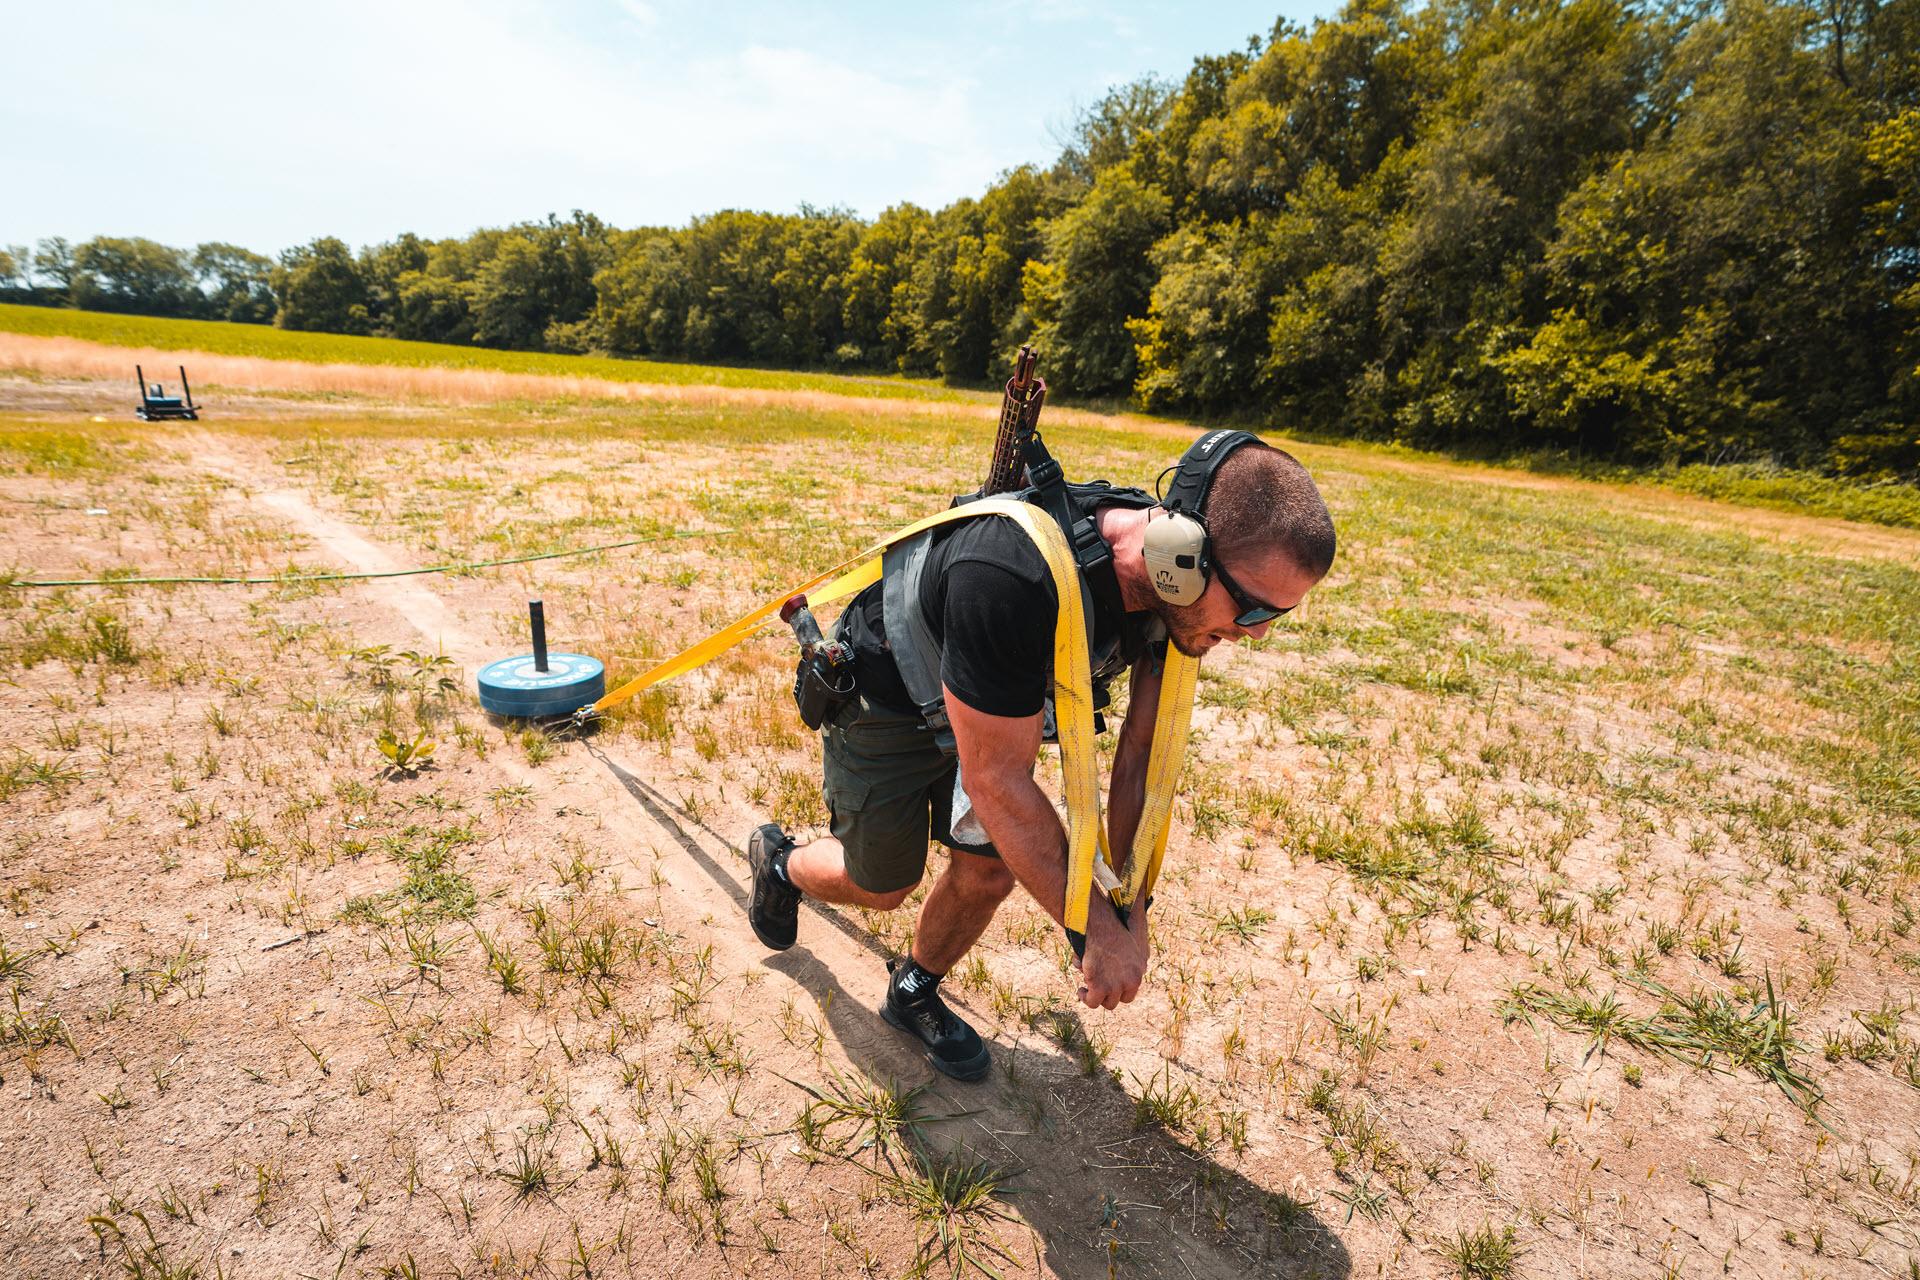 Jacob Heppner Pulling a Sled